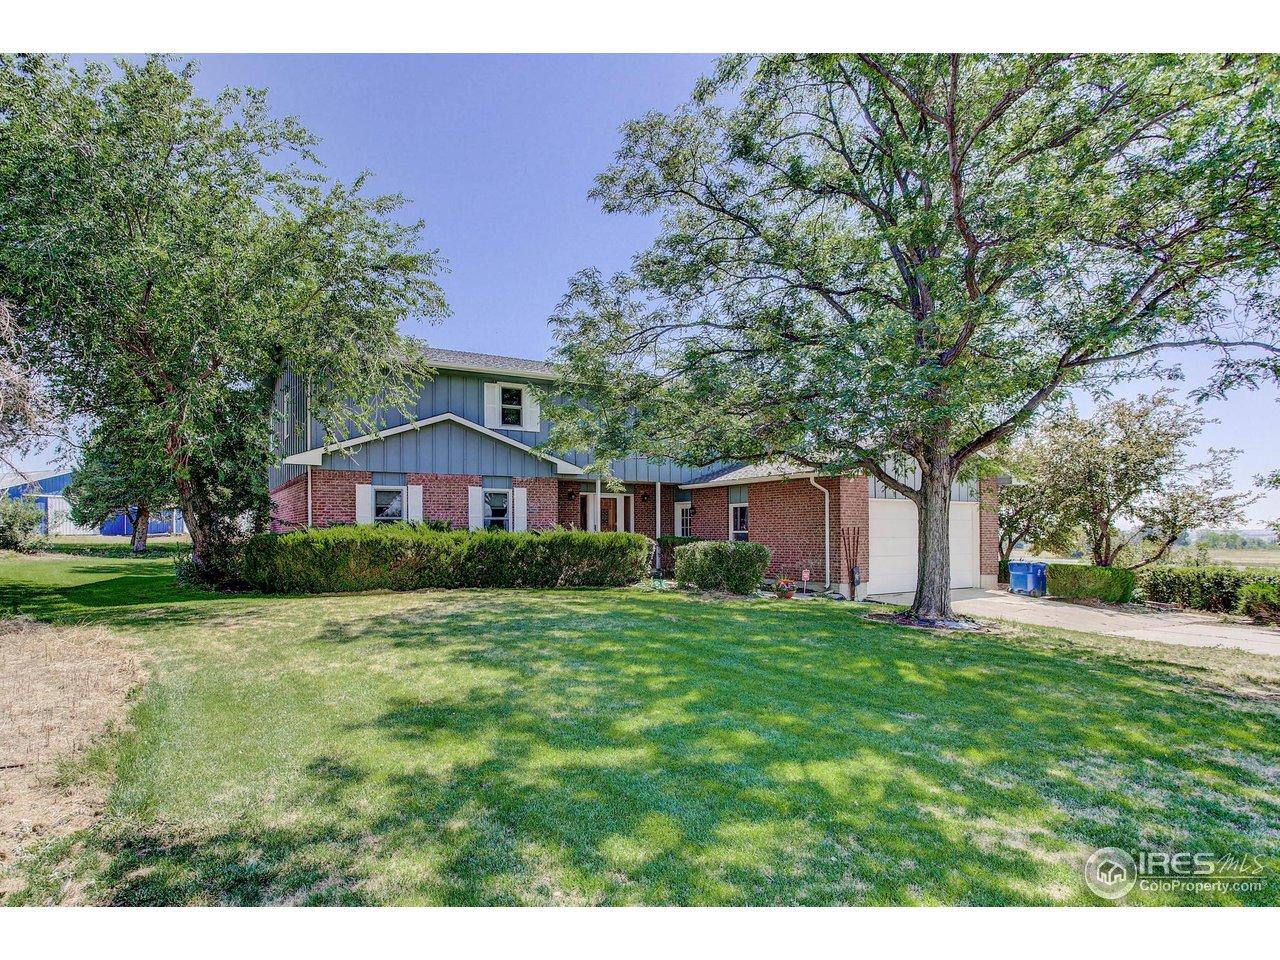 9625 Phillips Rd, Lafayette CO 80026